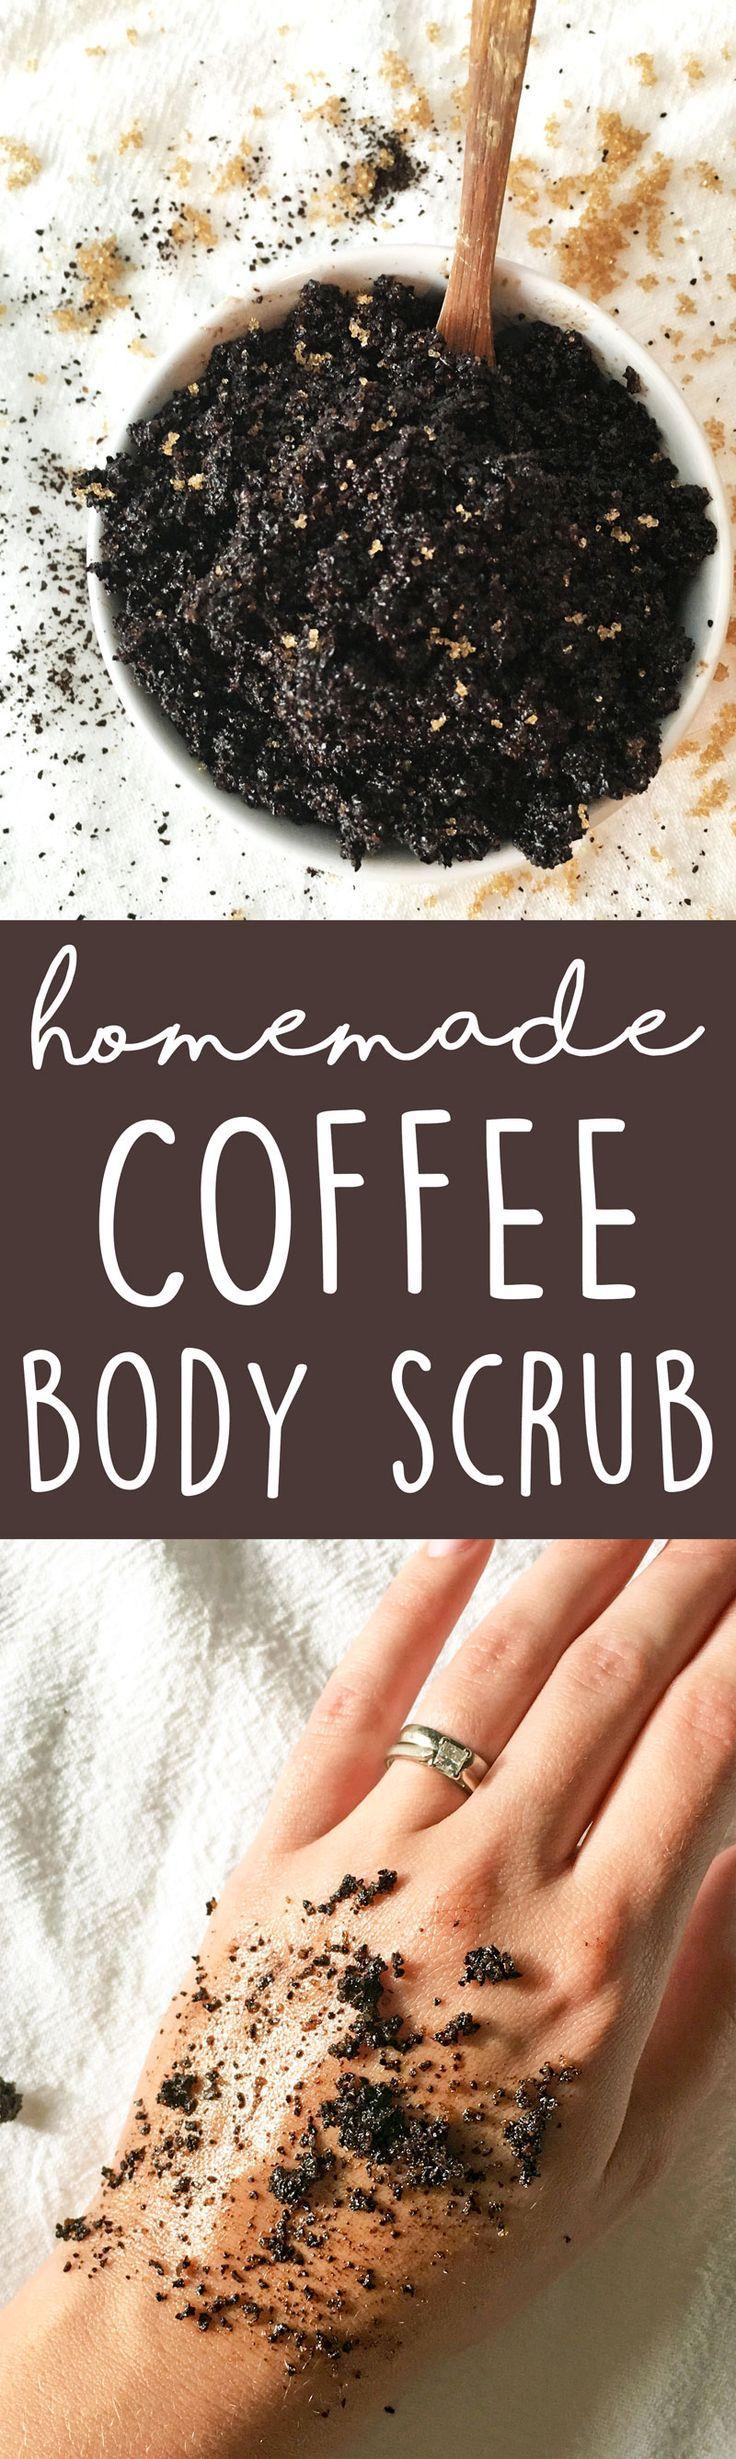 DIY Coffee Body Scrub - this 3-ingredient homemade body scrub recipe is great fo...